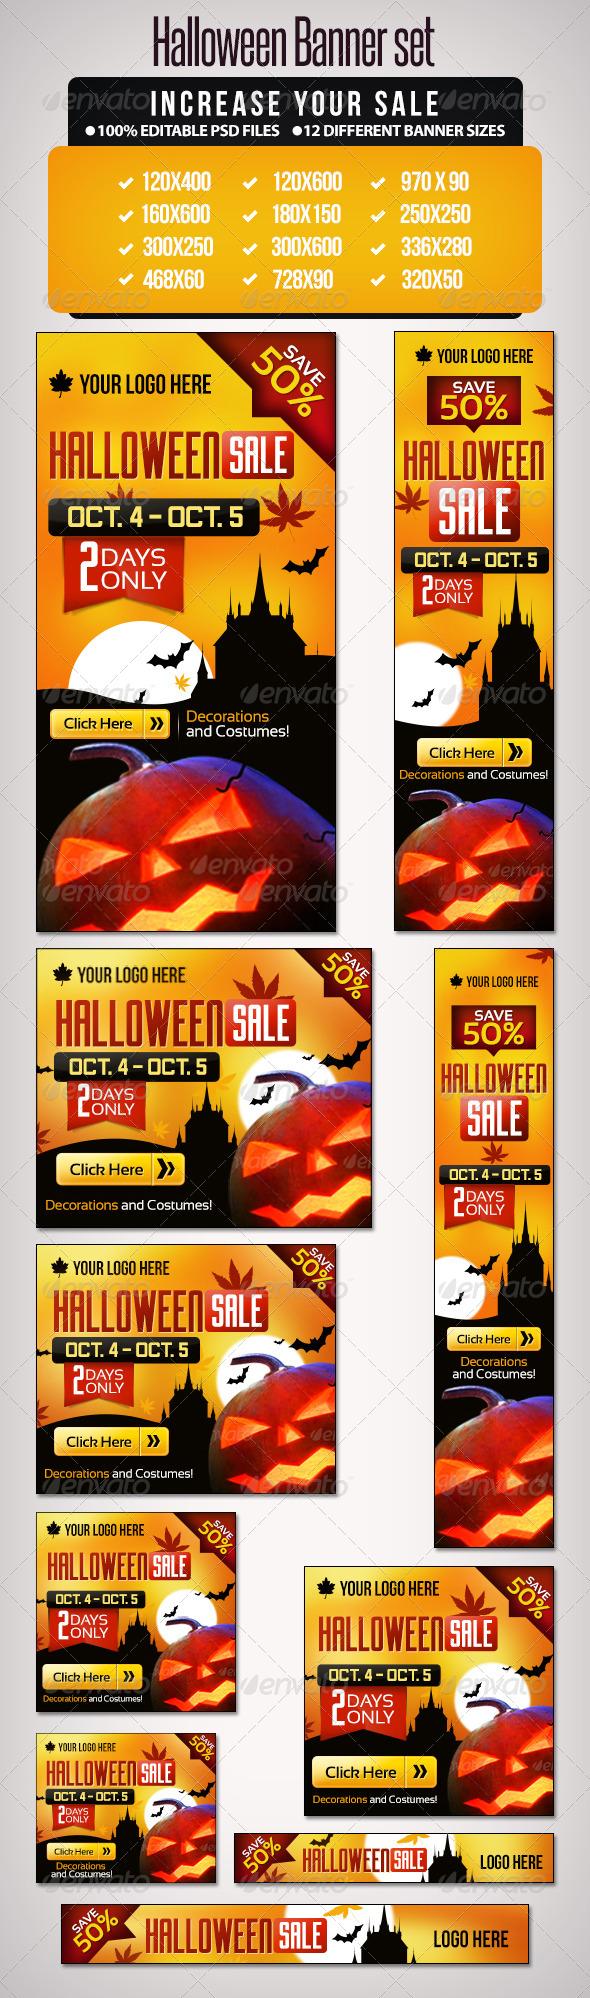 GraphicRiver Halloween Banner Set 1 12 Google Standard Sizes 5611979